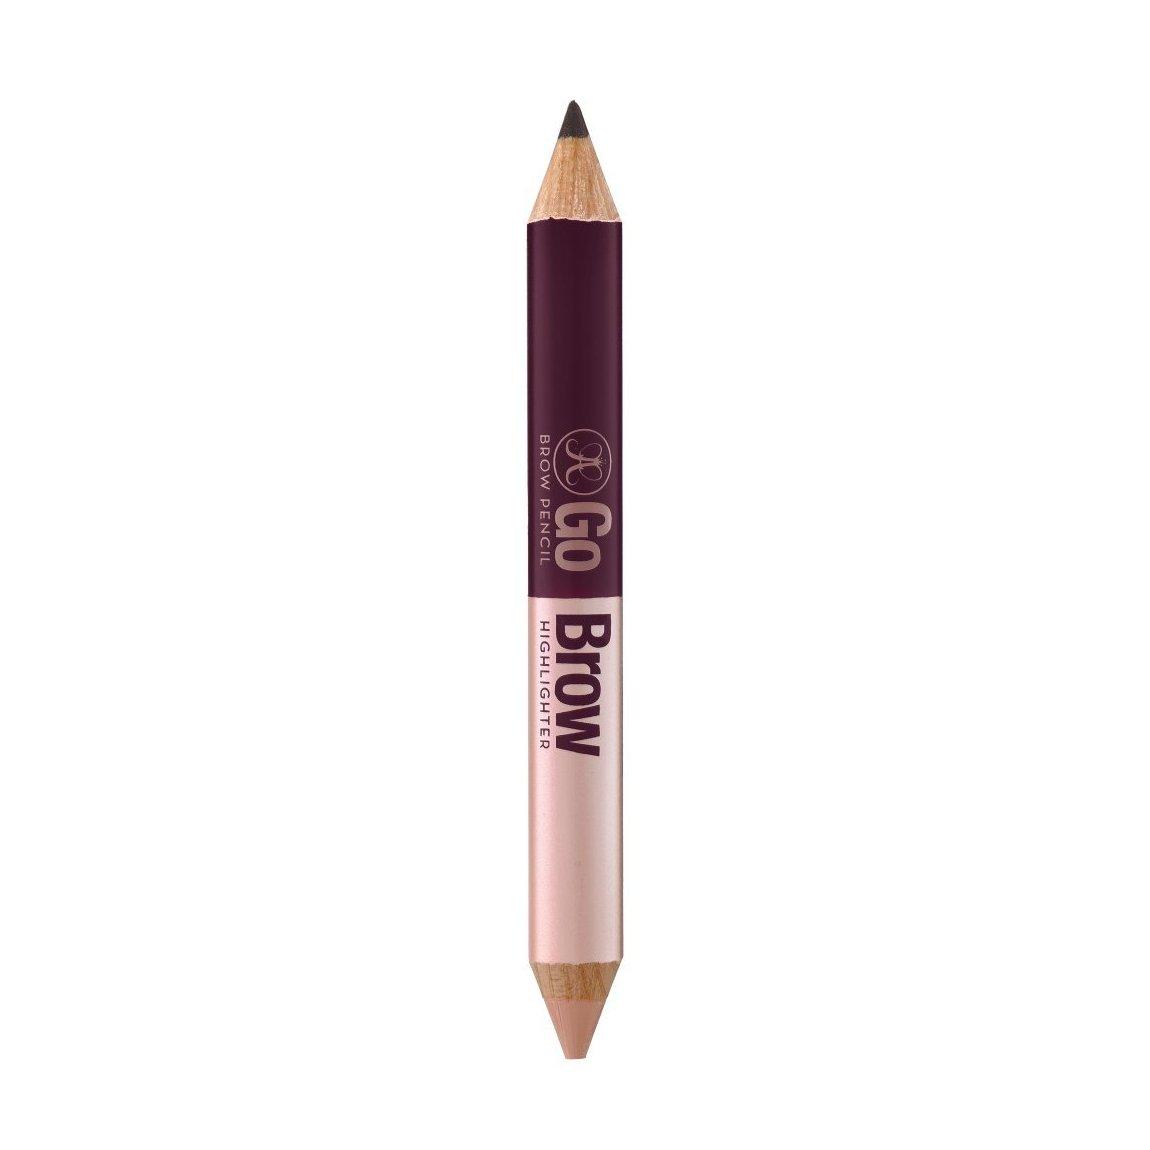 Anastasia Beverly Hills Go Brow Universal Brow Pencil Beautylish